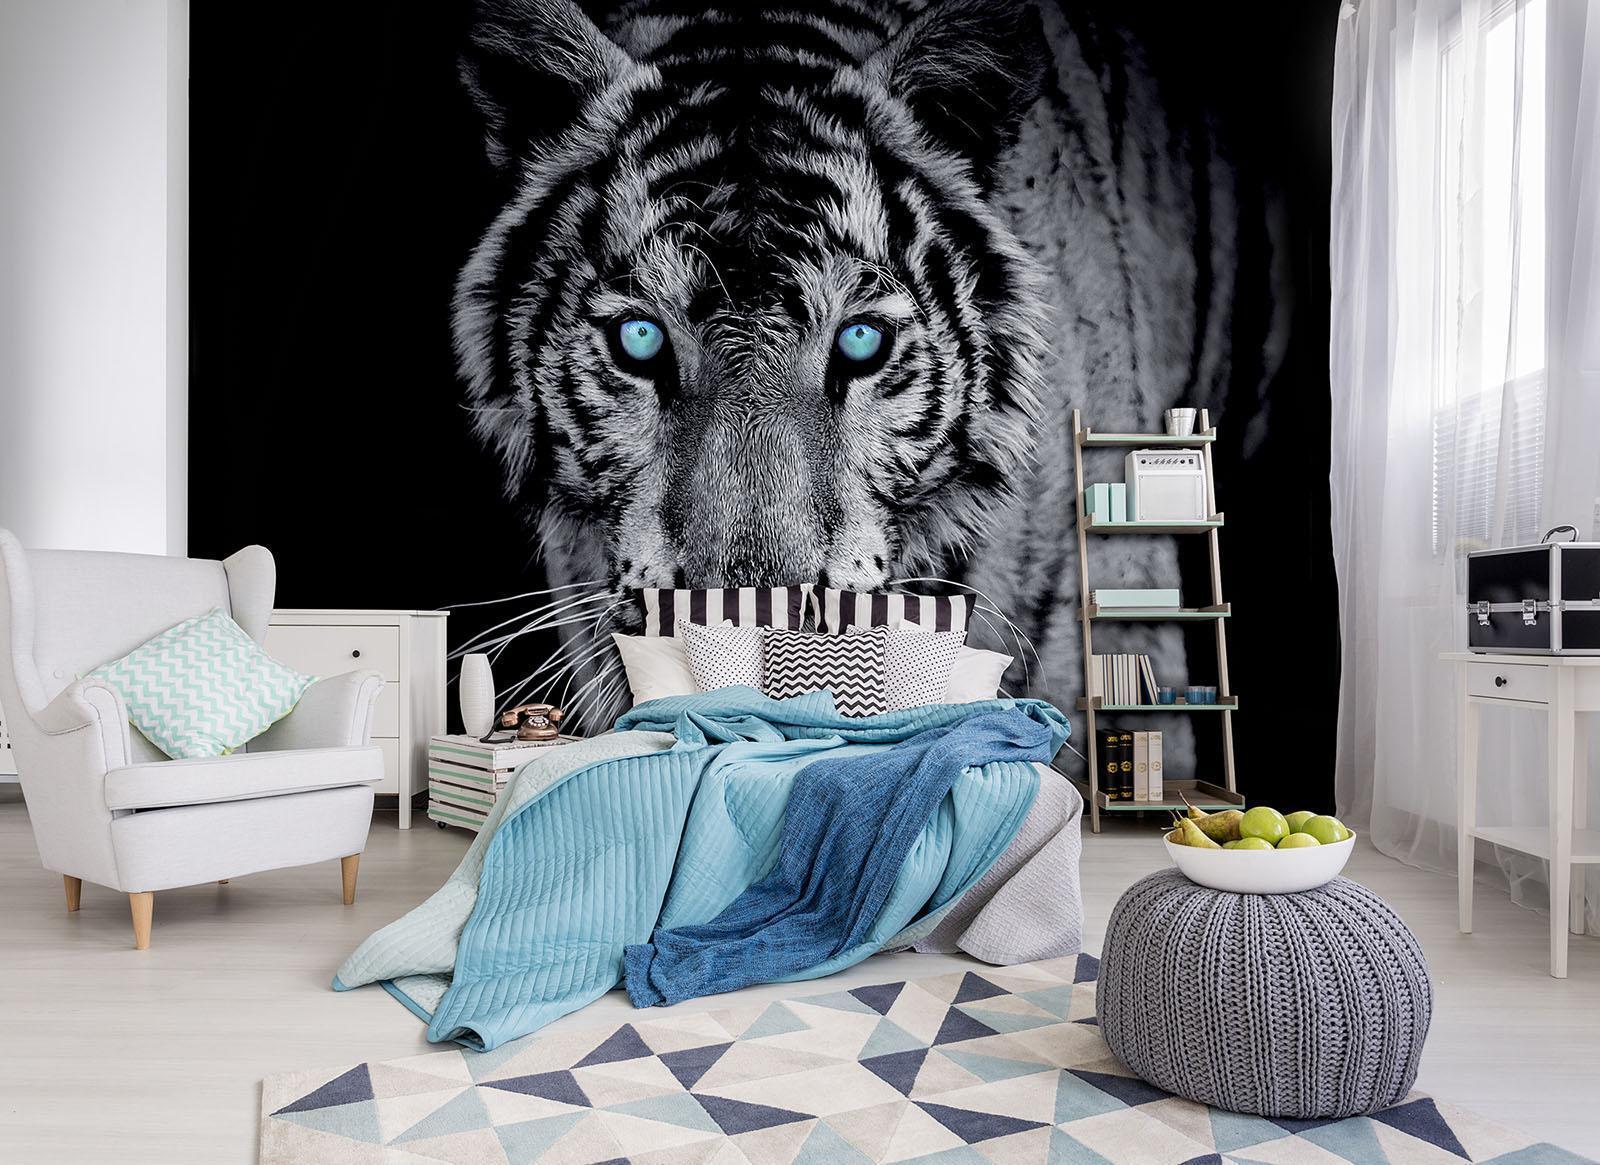 Photo Wallpaper Mural  10202_P Tiger Tiger Animal Blau Eyes Wildness grau